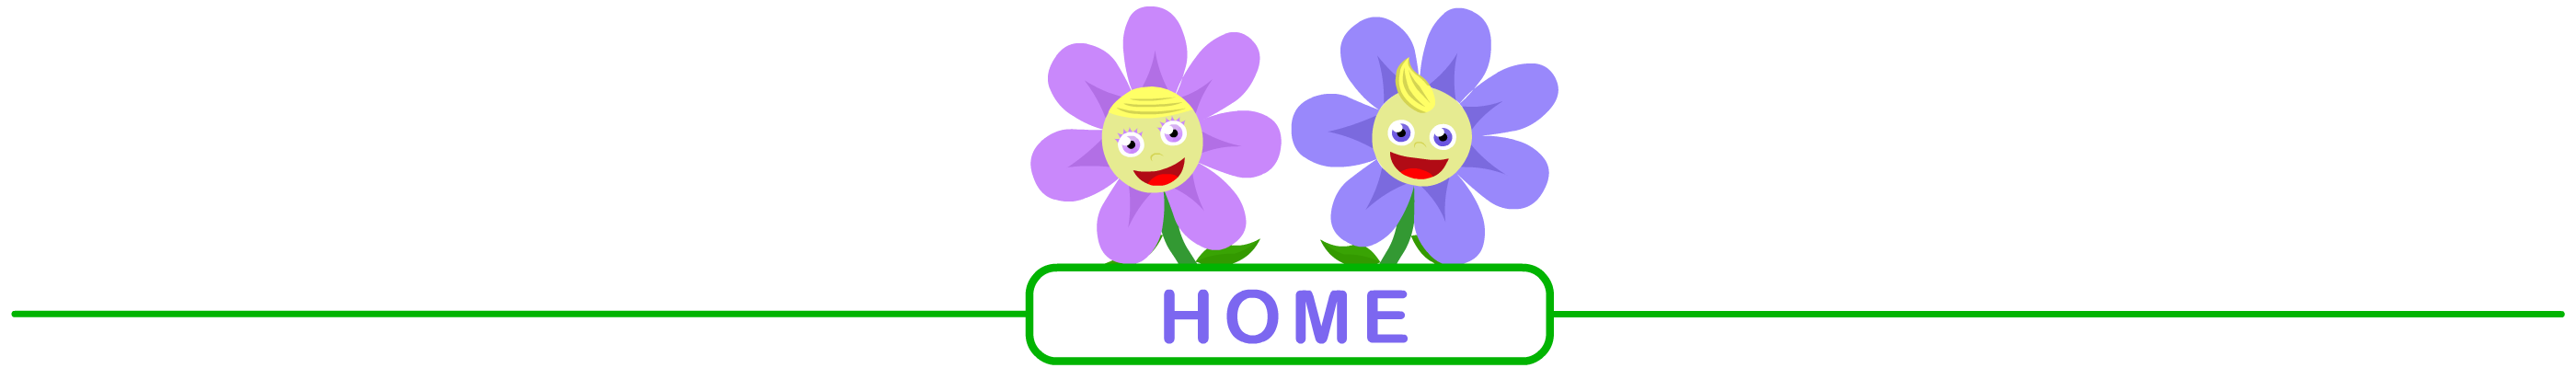 home_titel